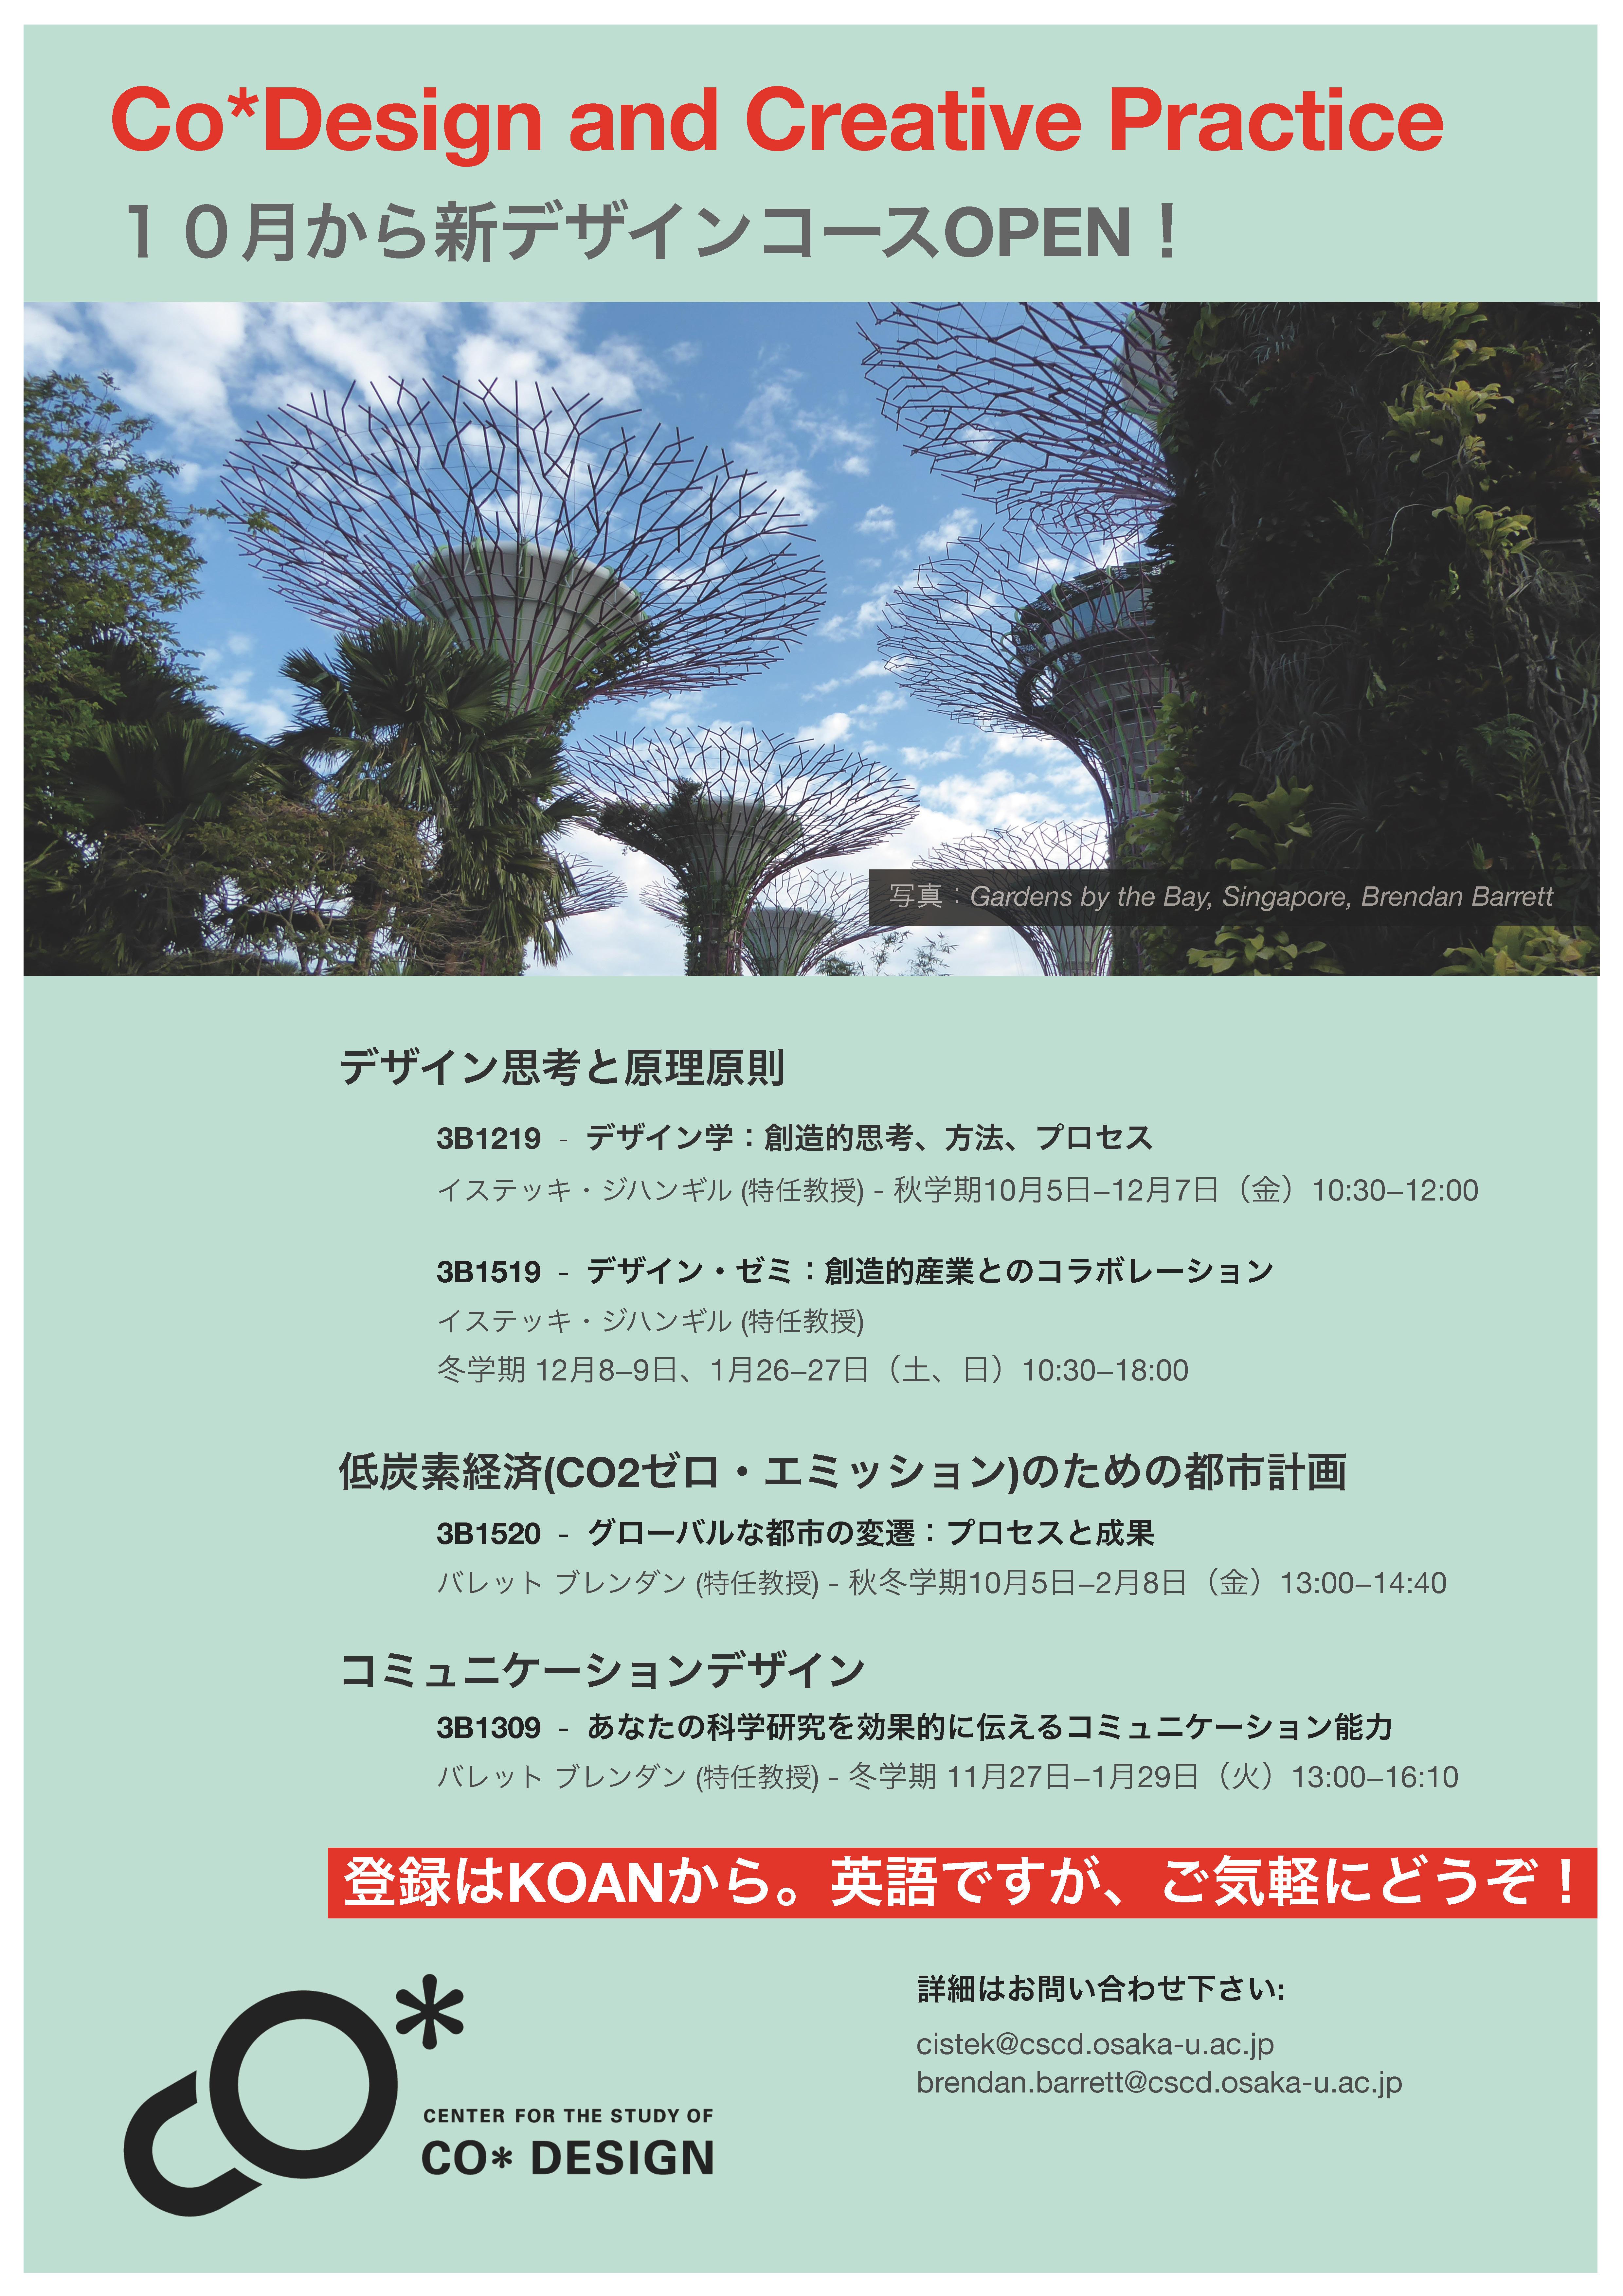 Course_Promotion_JP_20170926_ci.jpg